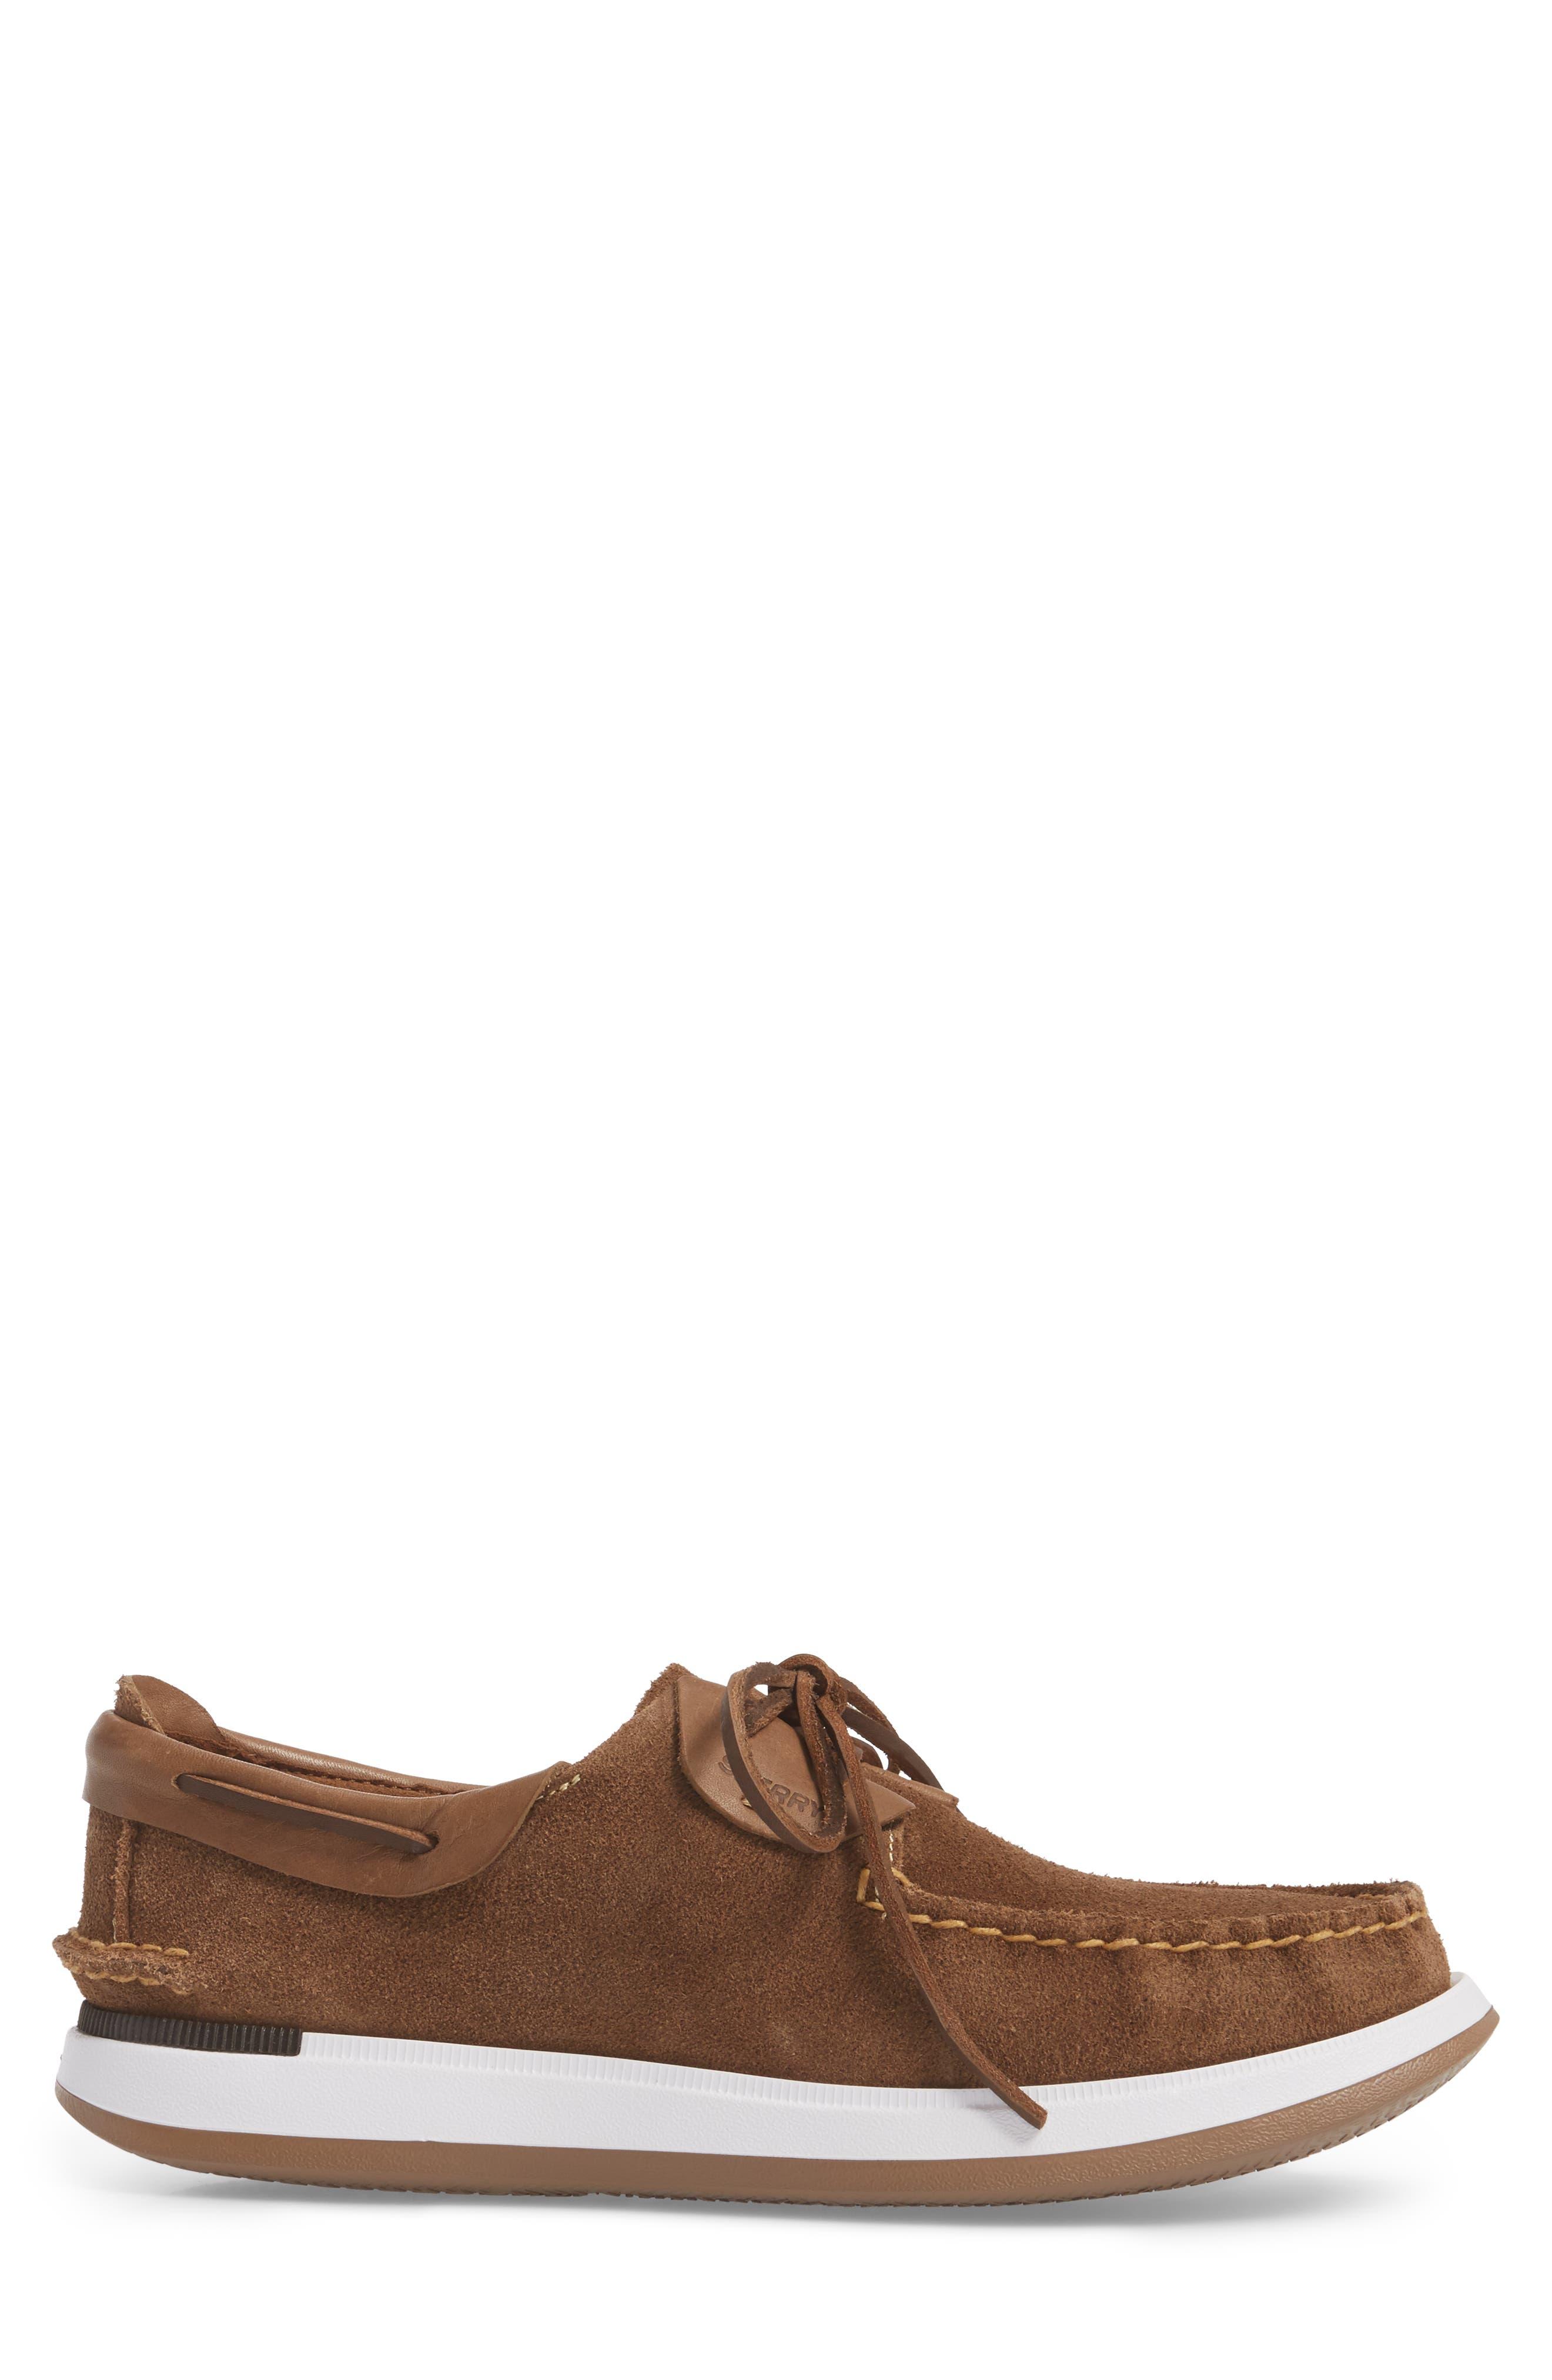 Caspian Boat Shoe,                             Alternate thumbnail 3, color,                             Tan Leather/ Suede